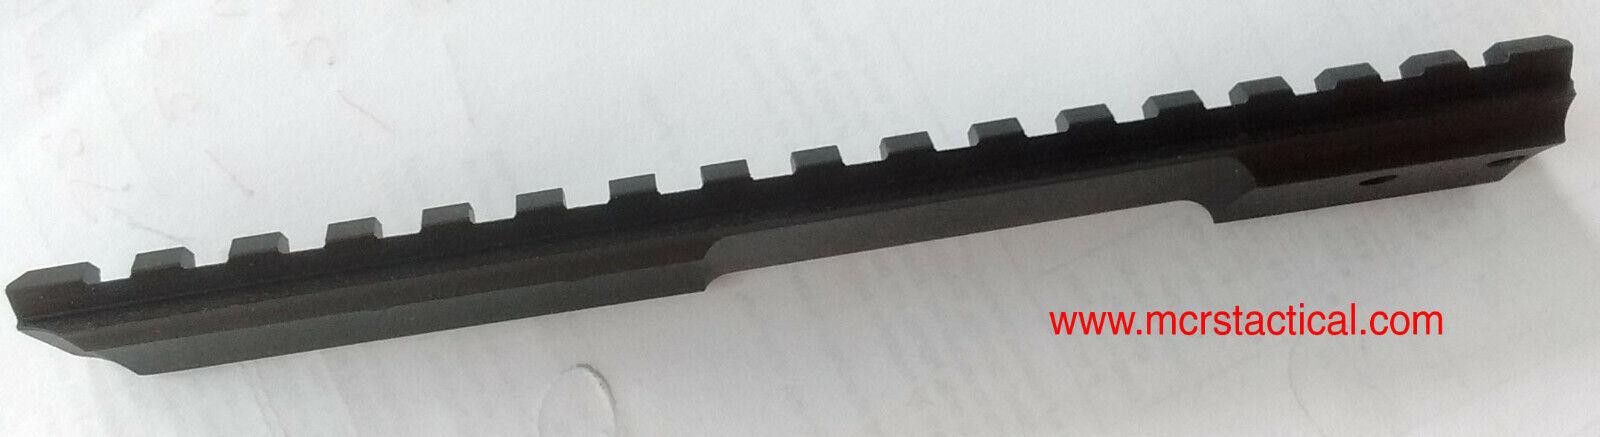 Carril Picatinny-Winchester 70 SA (Negro) 0 10 20 30 40 50 60 70 Moa mil